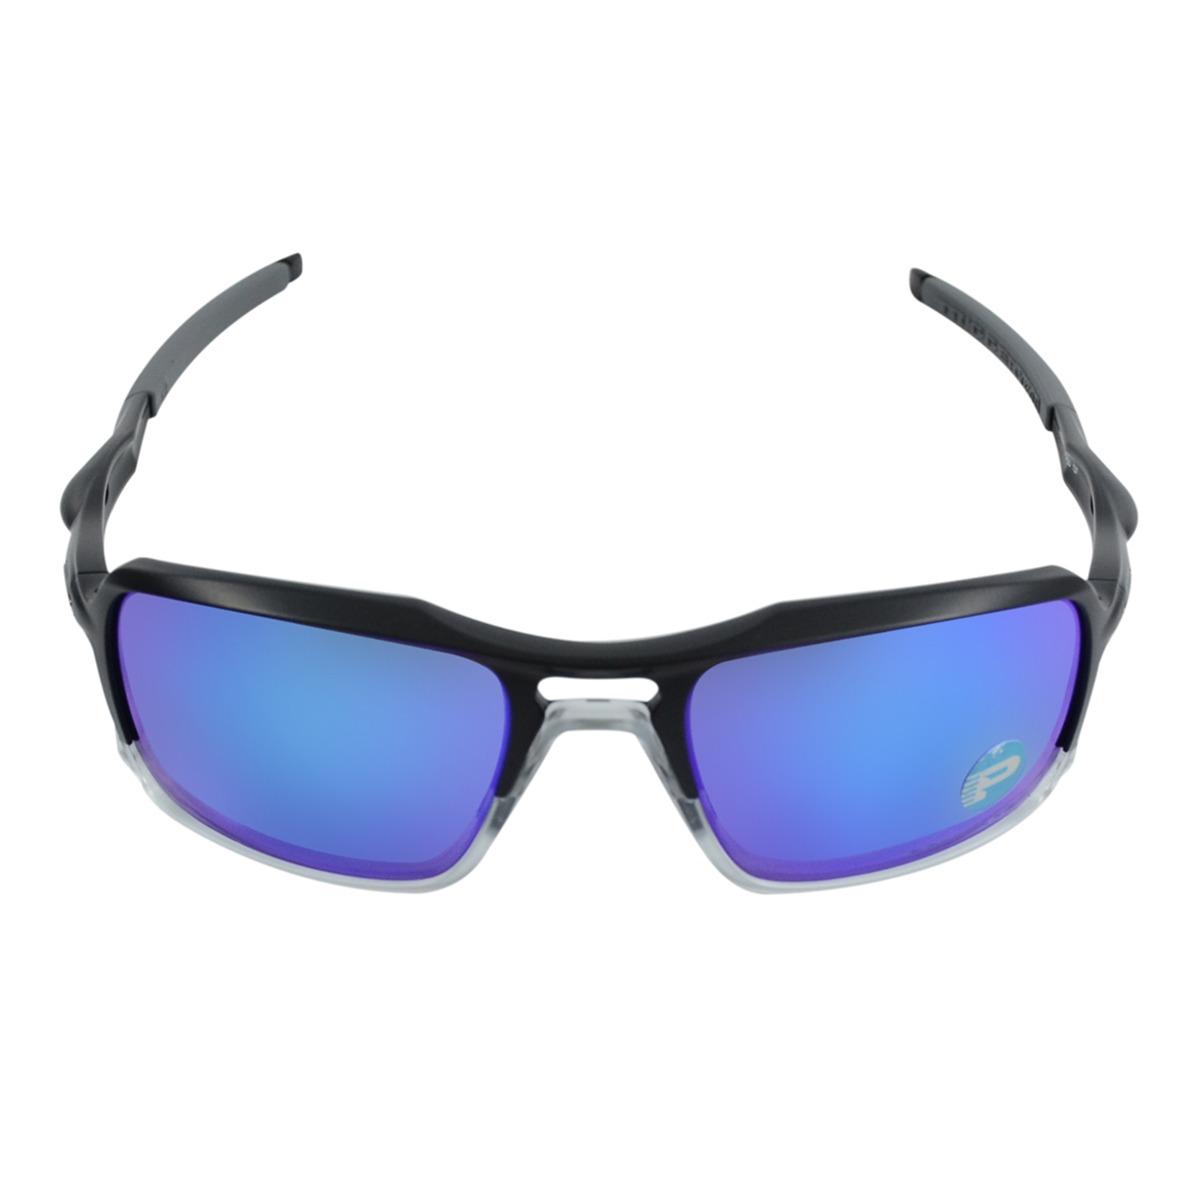 4d75ab21f154b óculos masculino oakley triggerman matte black sapphire pola. Carregando  zoom.